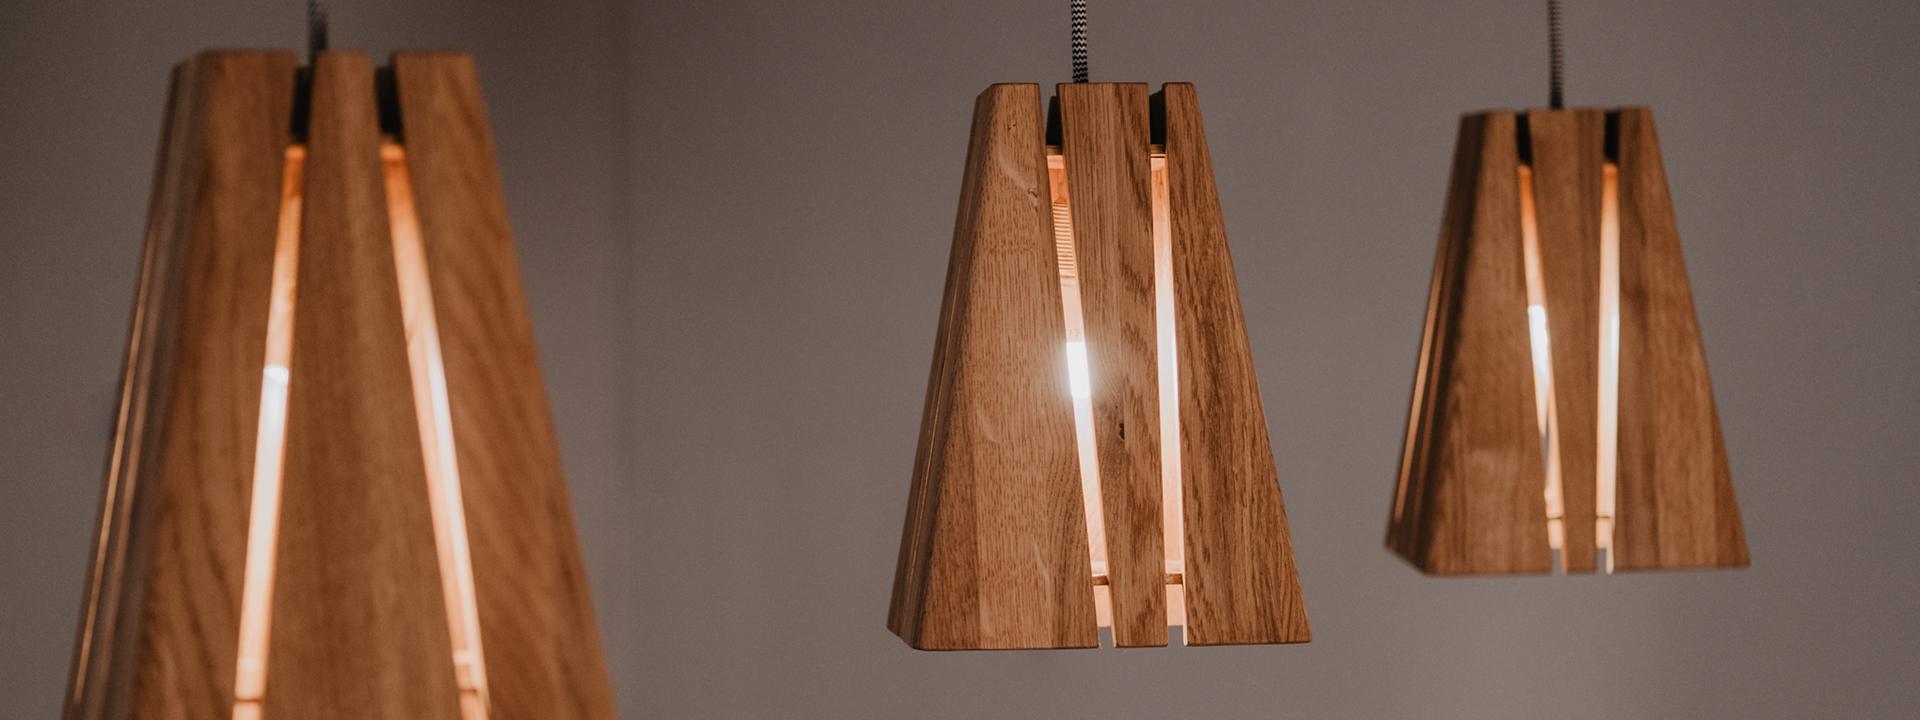 Tischlerei HolzWerk - feine moebel - Lampe Lambert Dreifach Ansicht Komplett